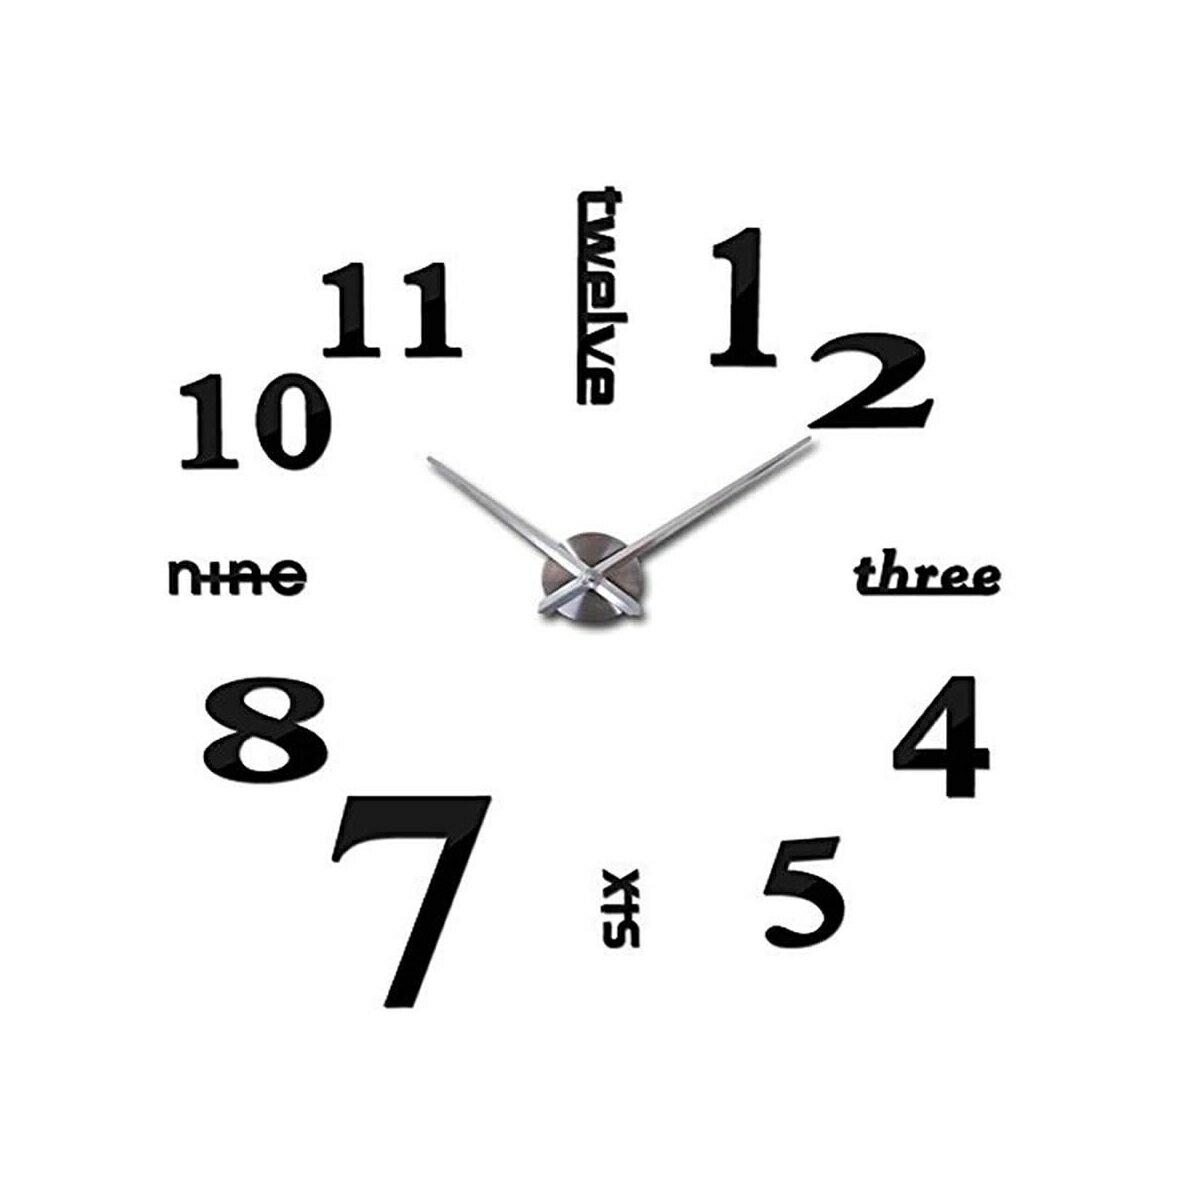 DIY 壁時計 ウォールクロック シルバー針×ブラック文字 シンプル おしゃれ 壁掛け時計[新生活][時計][ギフト][送料無料(一部地域を除く)]